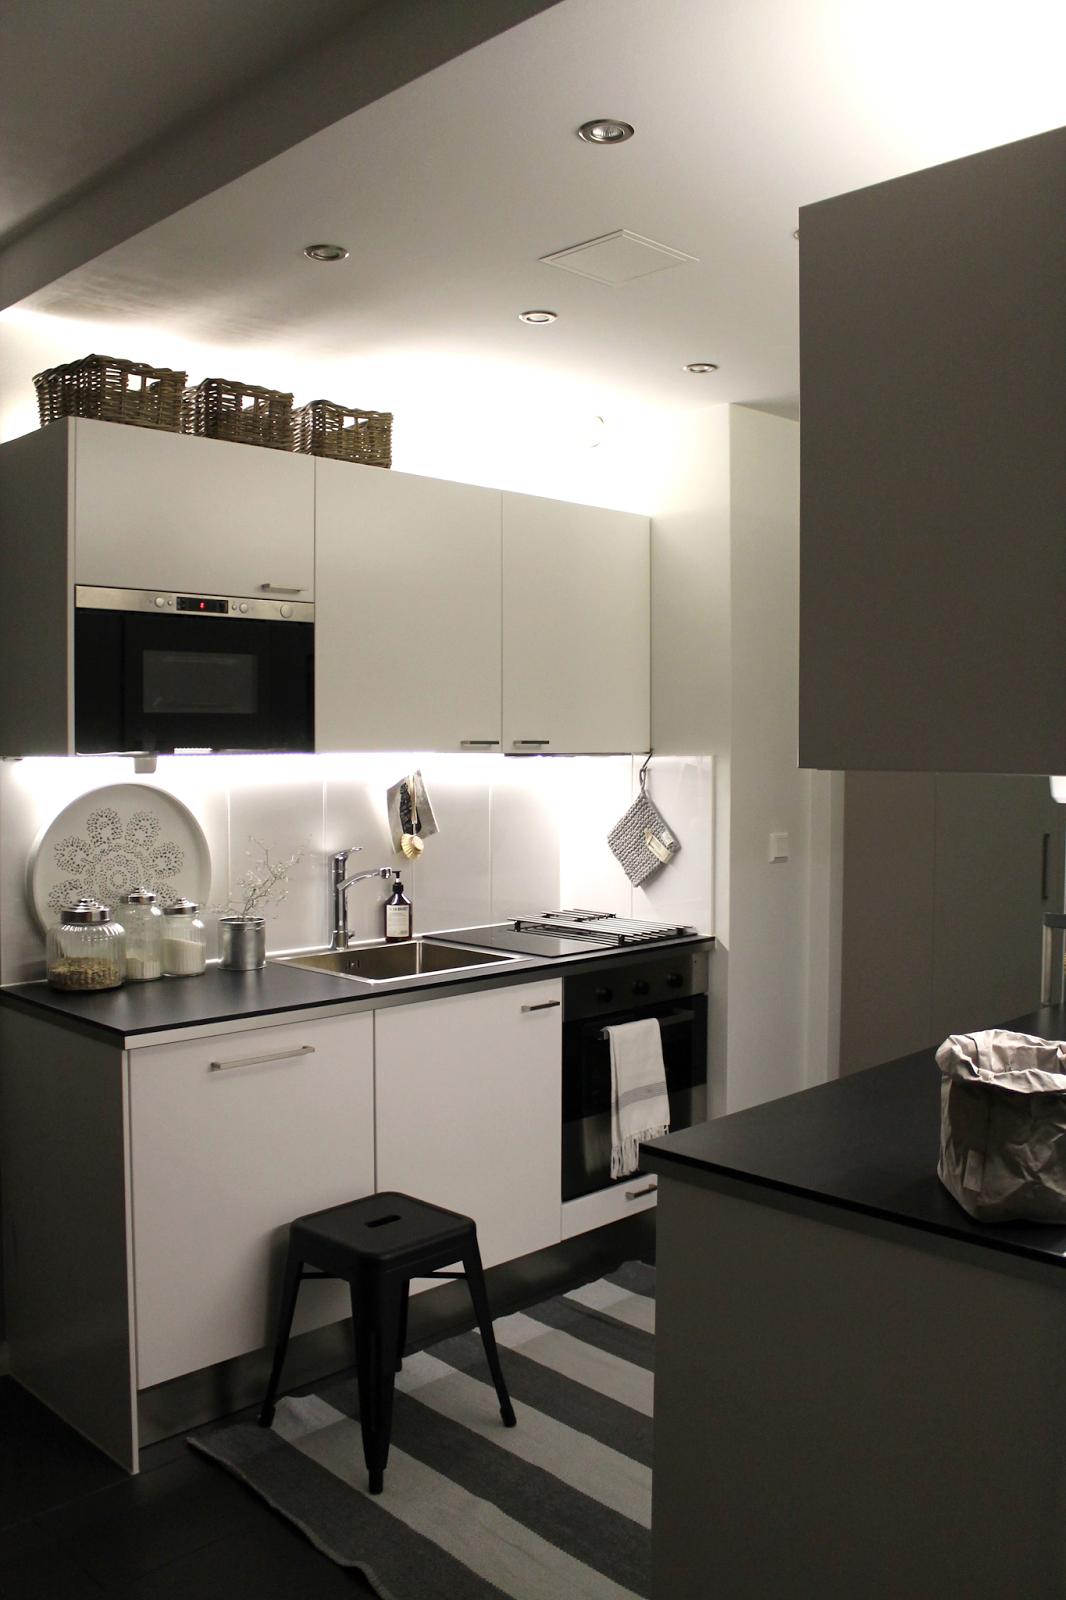 Ikea Led Lights In Kitchen